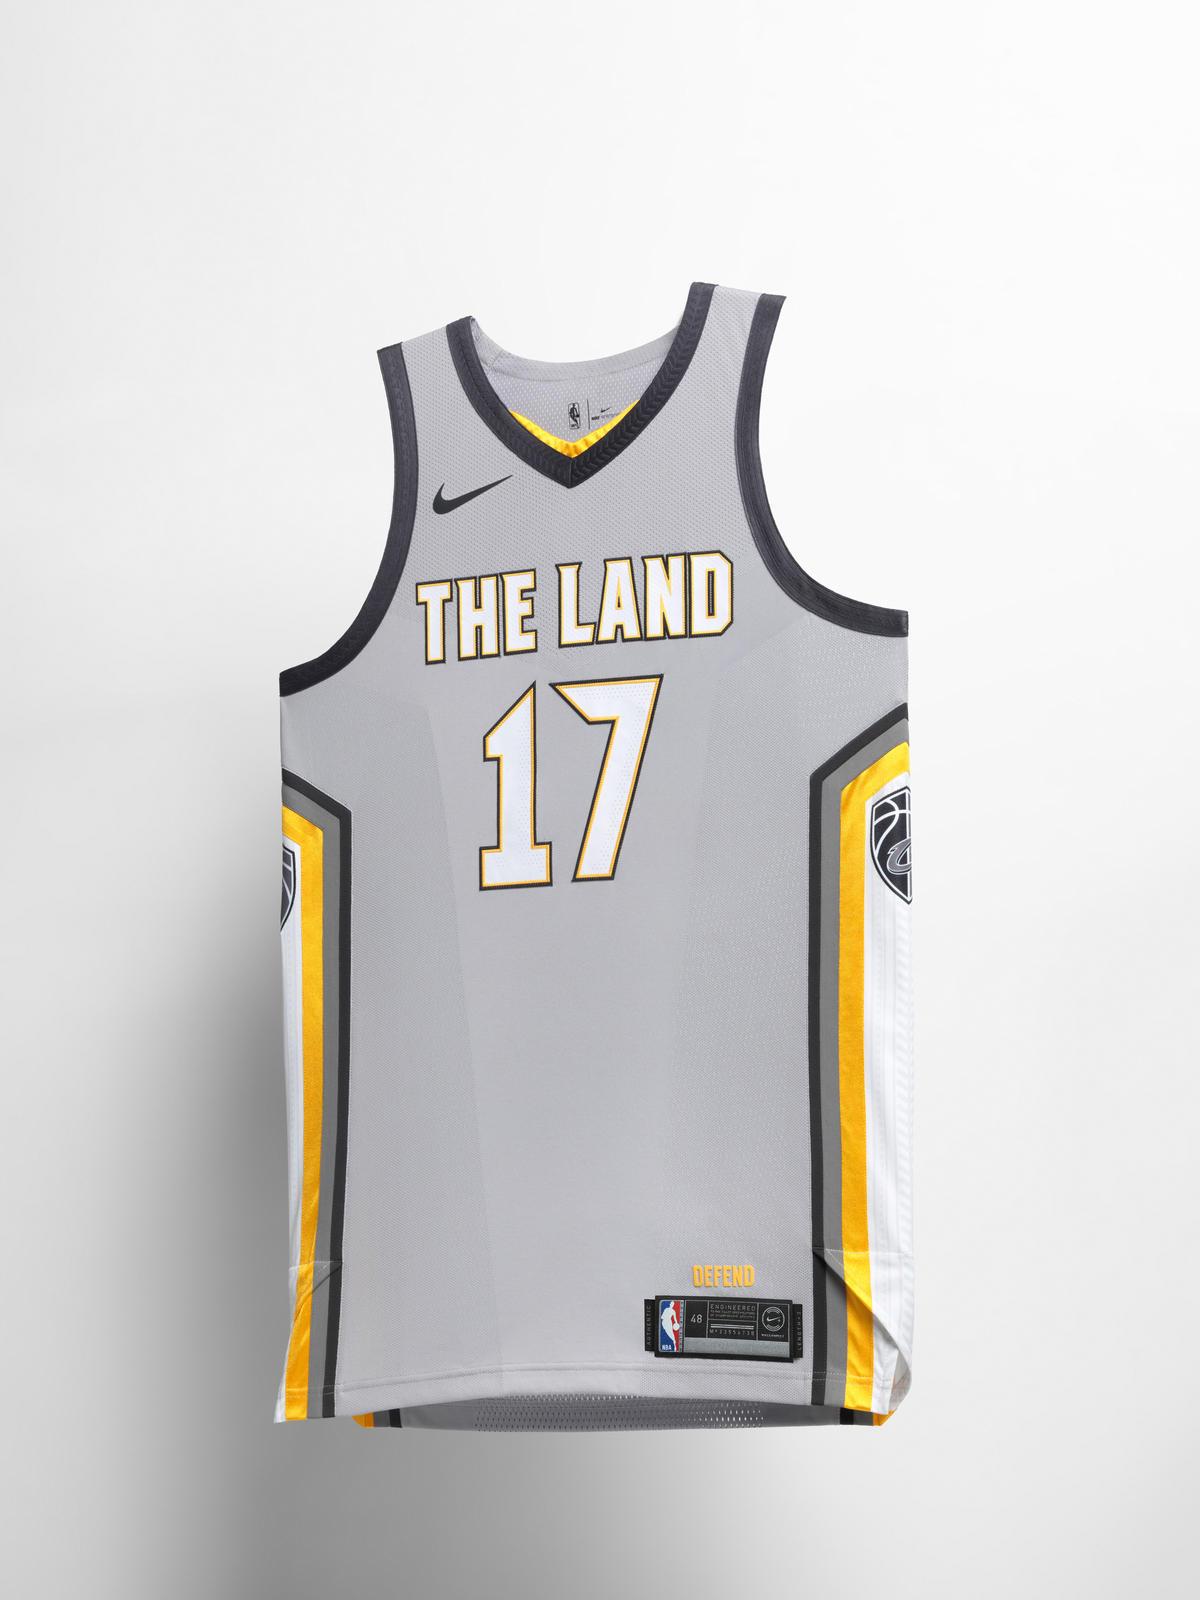 Nike_NBA_City_Edition_Uniform_Cleveland_Cavaliers_0070_native_1600